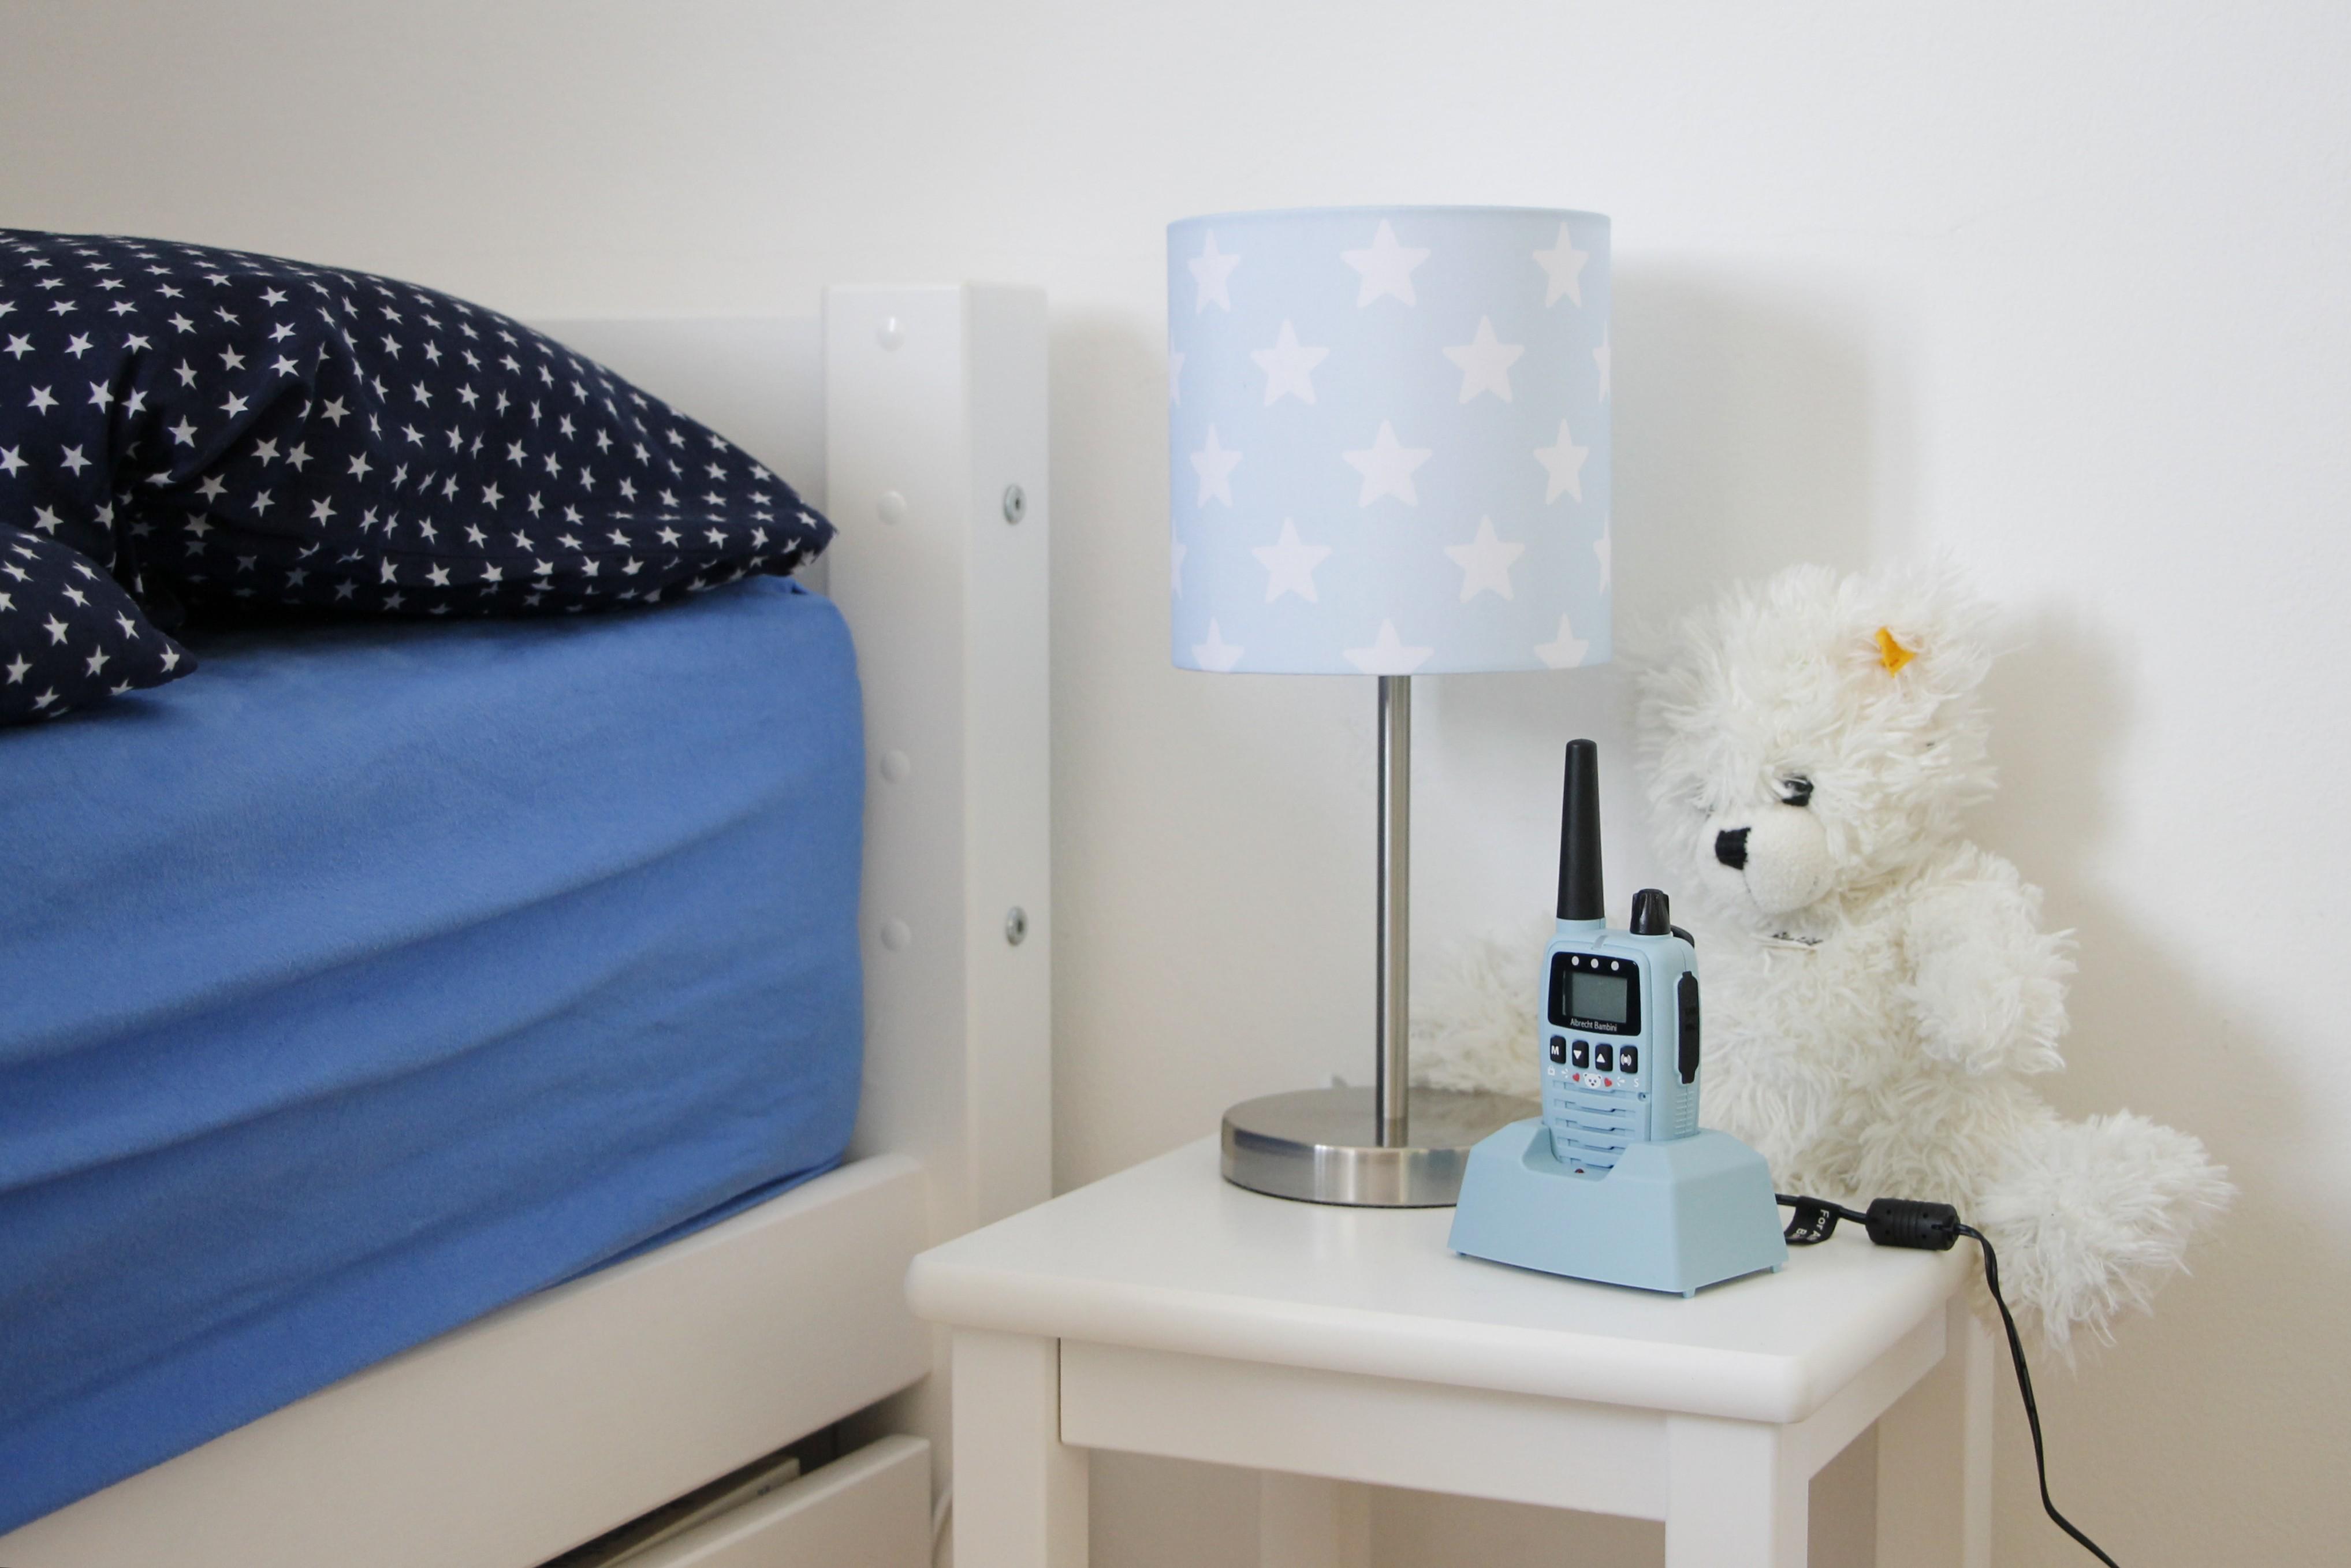 albrecht bambini babyphone testbericht lavendelblog. Black Bedroom Furniture Sets. Home Design Ideas